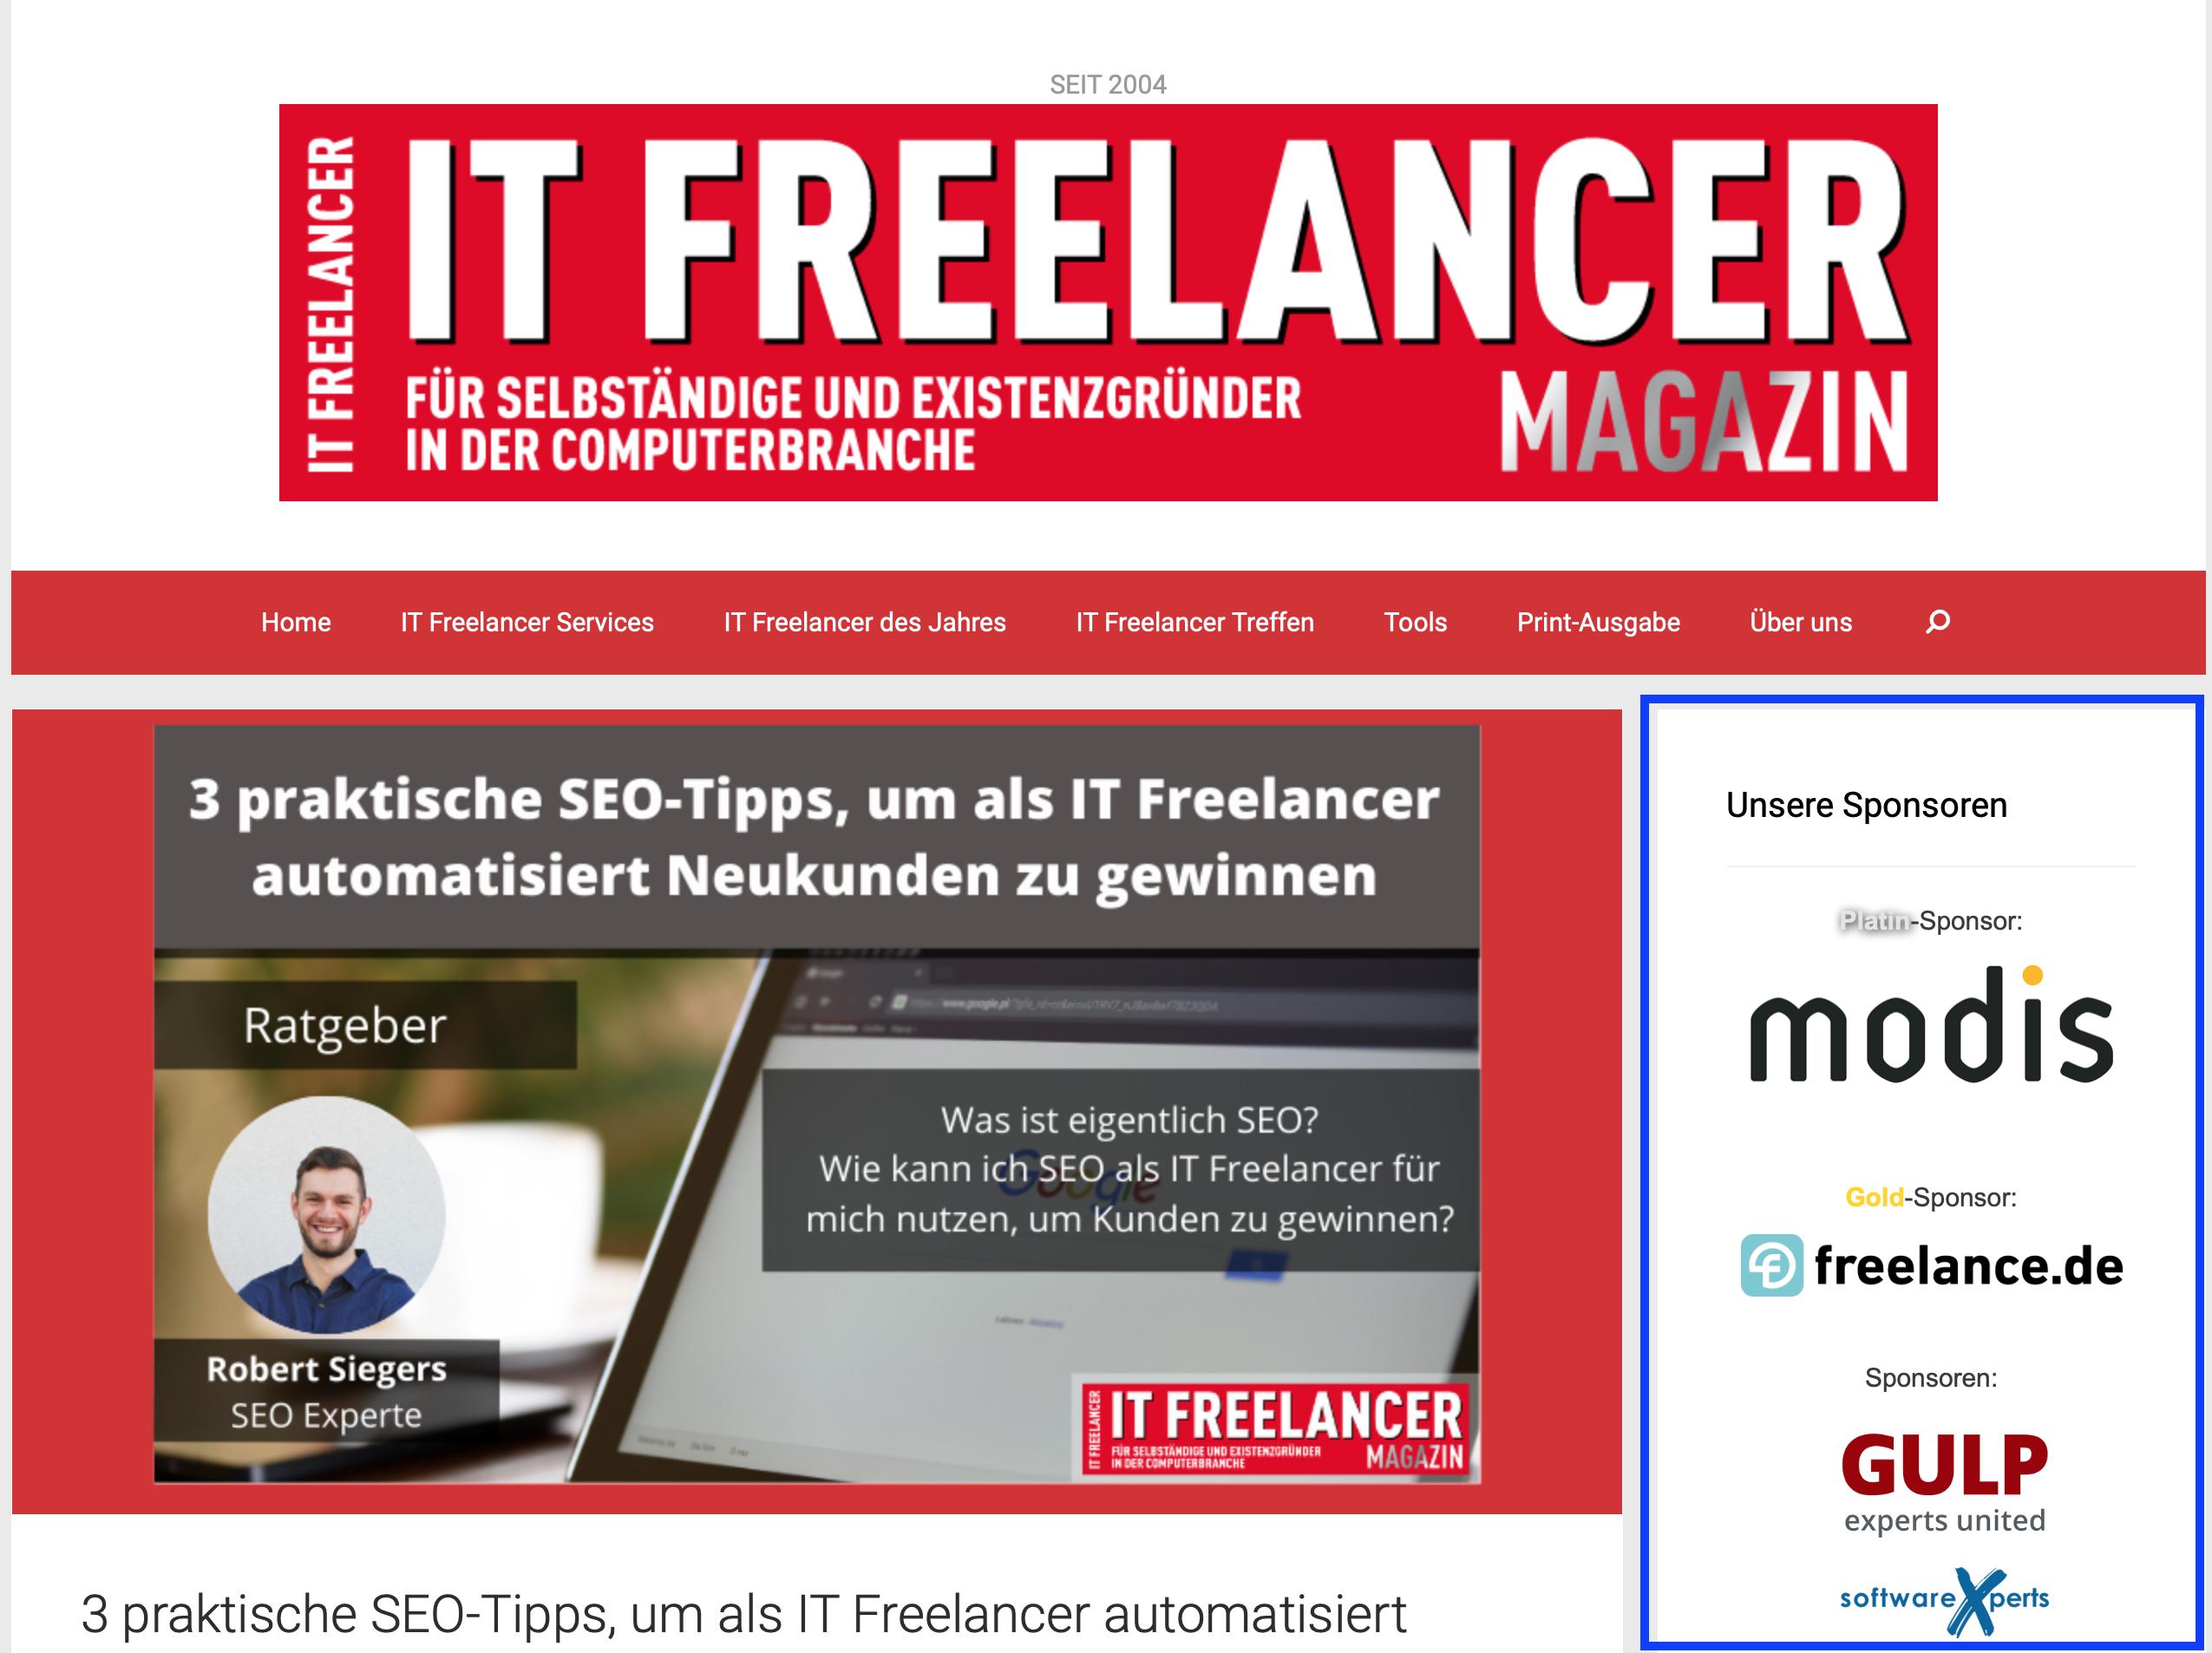 Sponsoring IT Freelancer Magazin